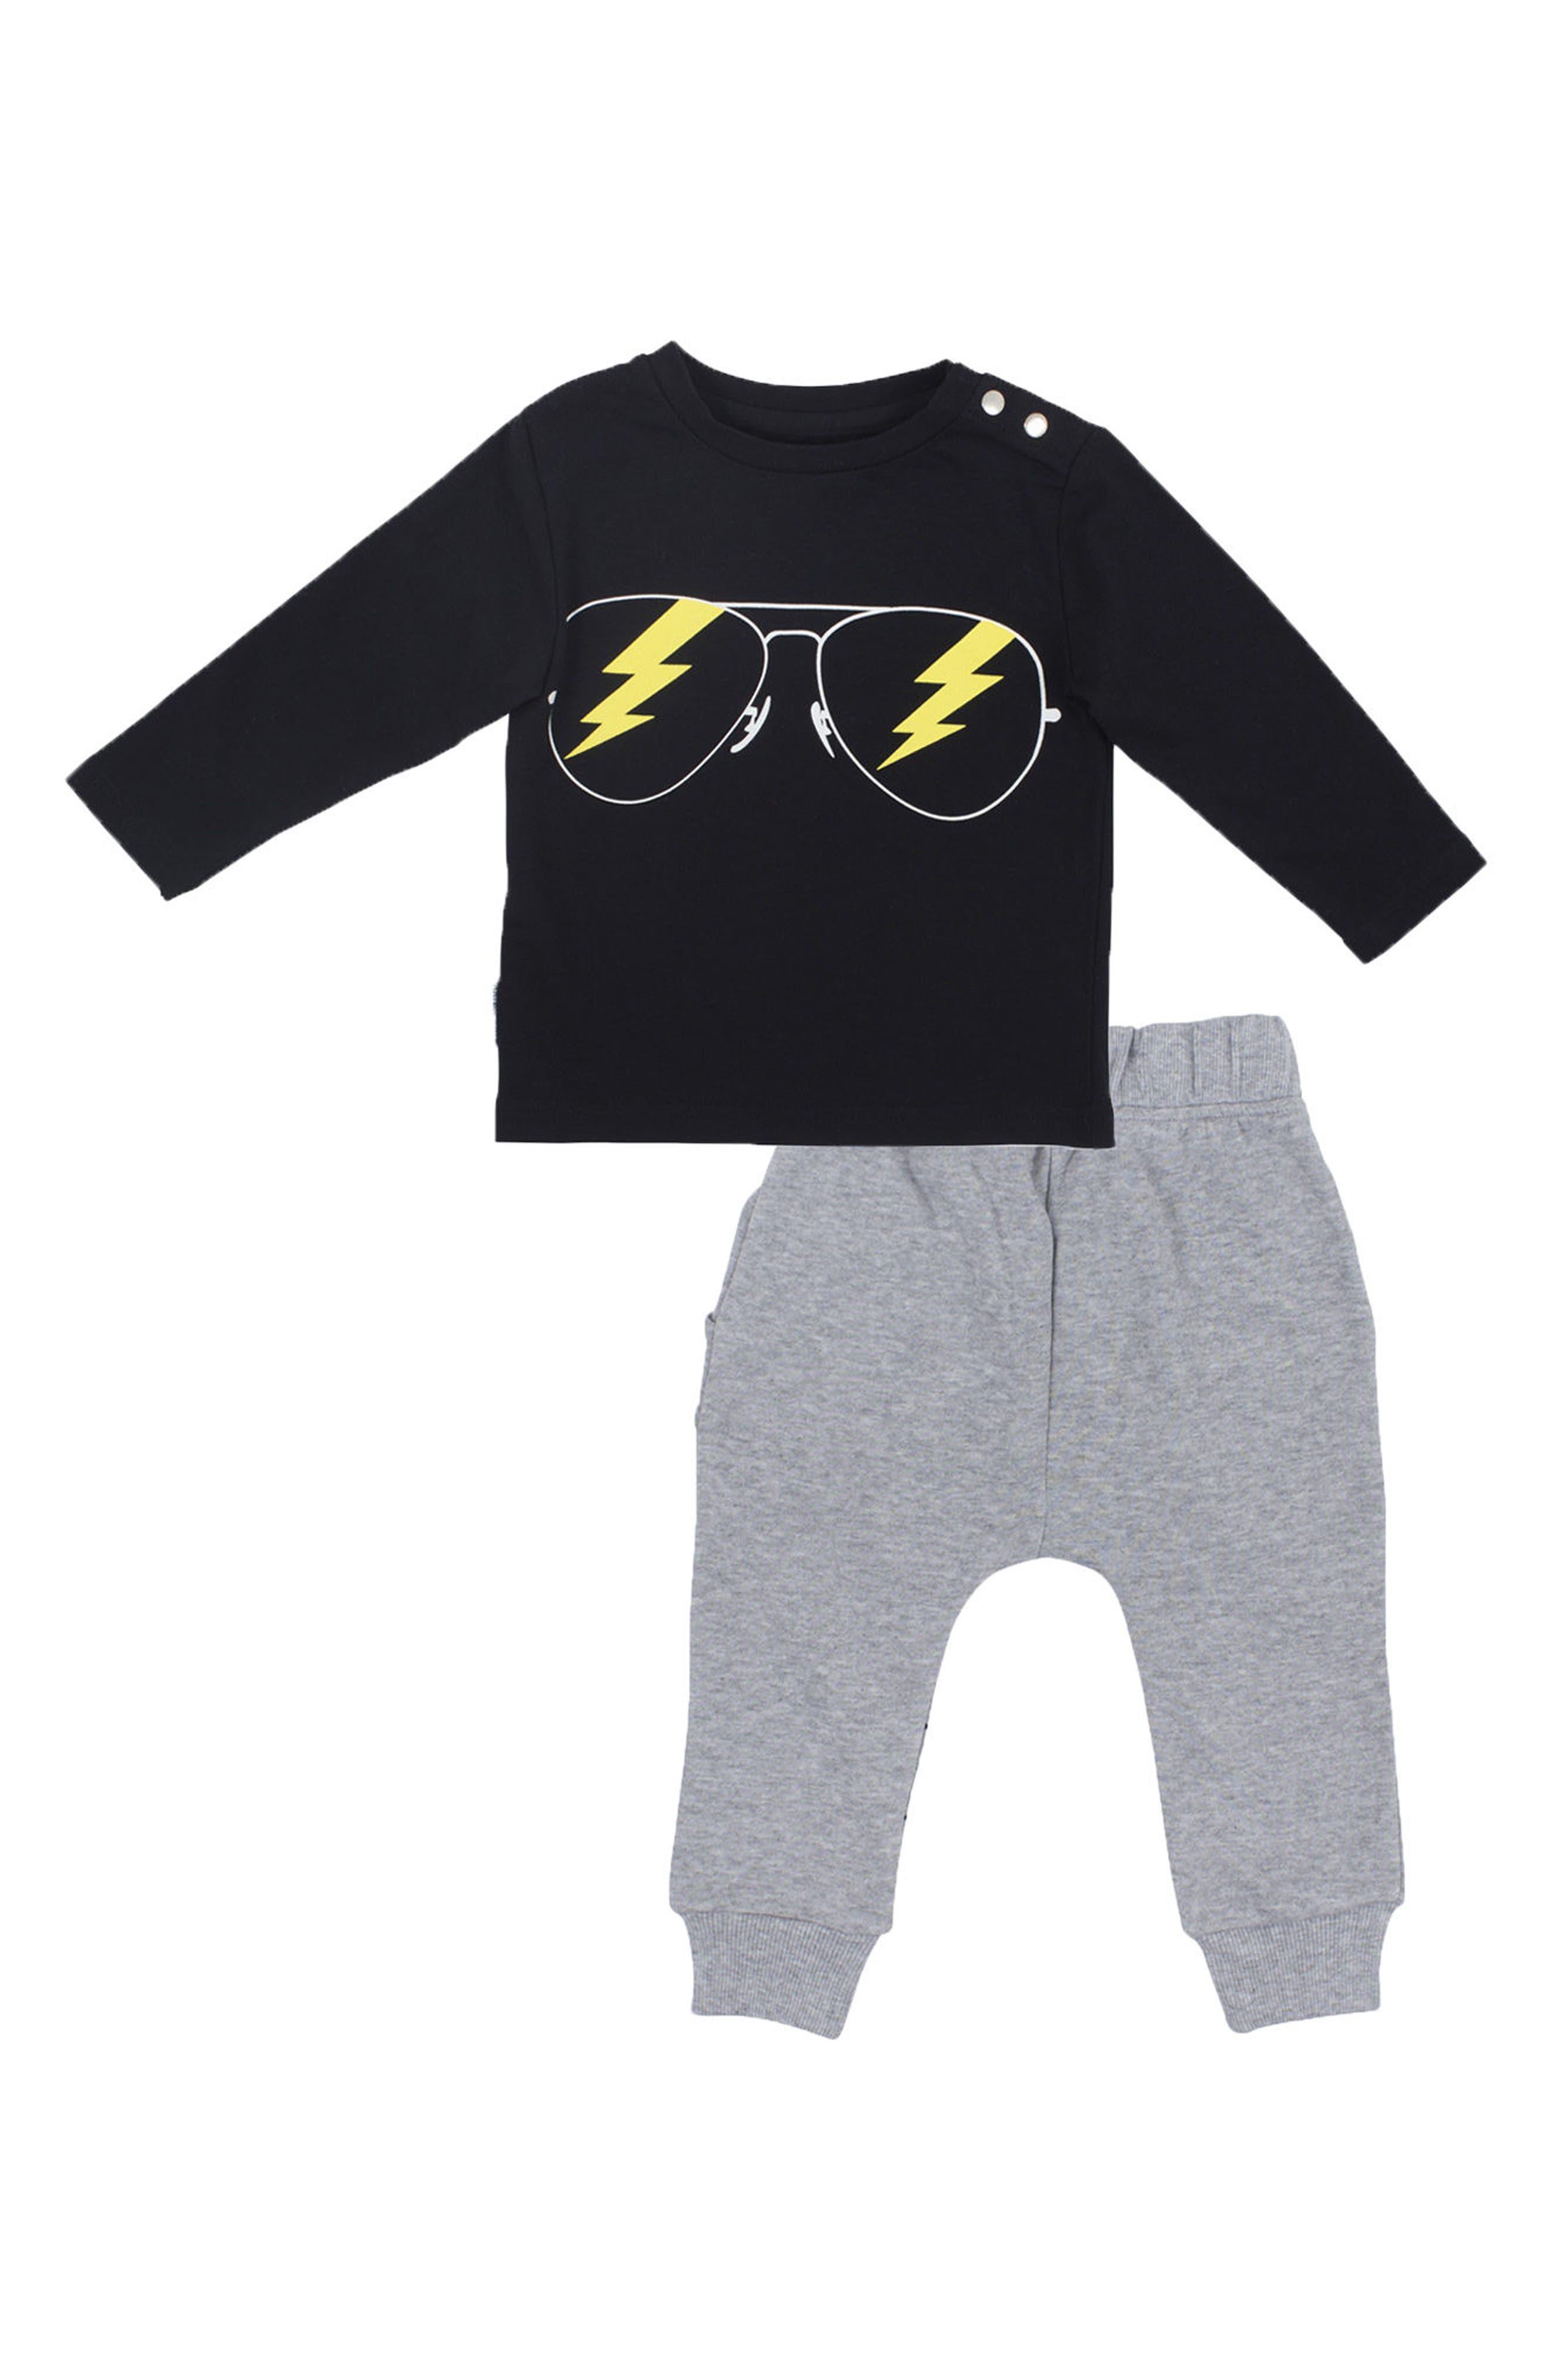 Rockstar T-Shirt & Jogger Pants Set,                         Main,                         color, Black